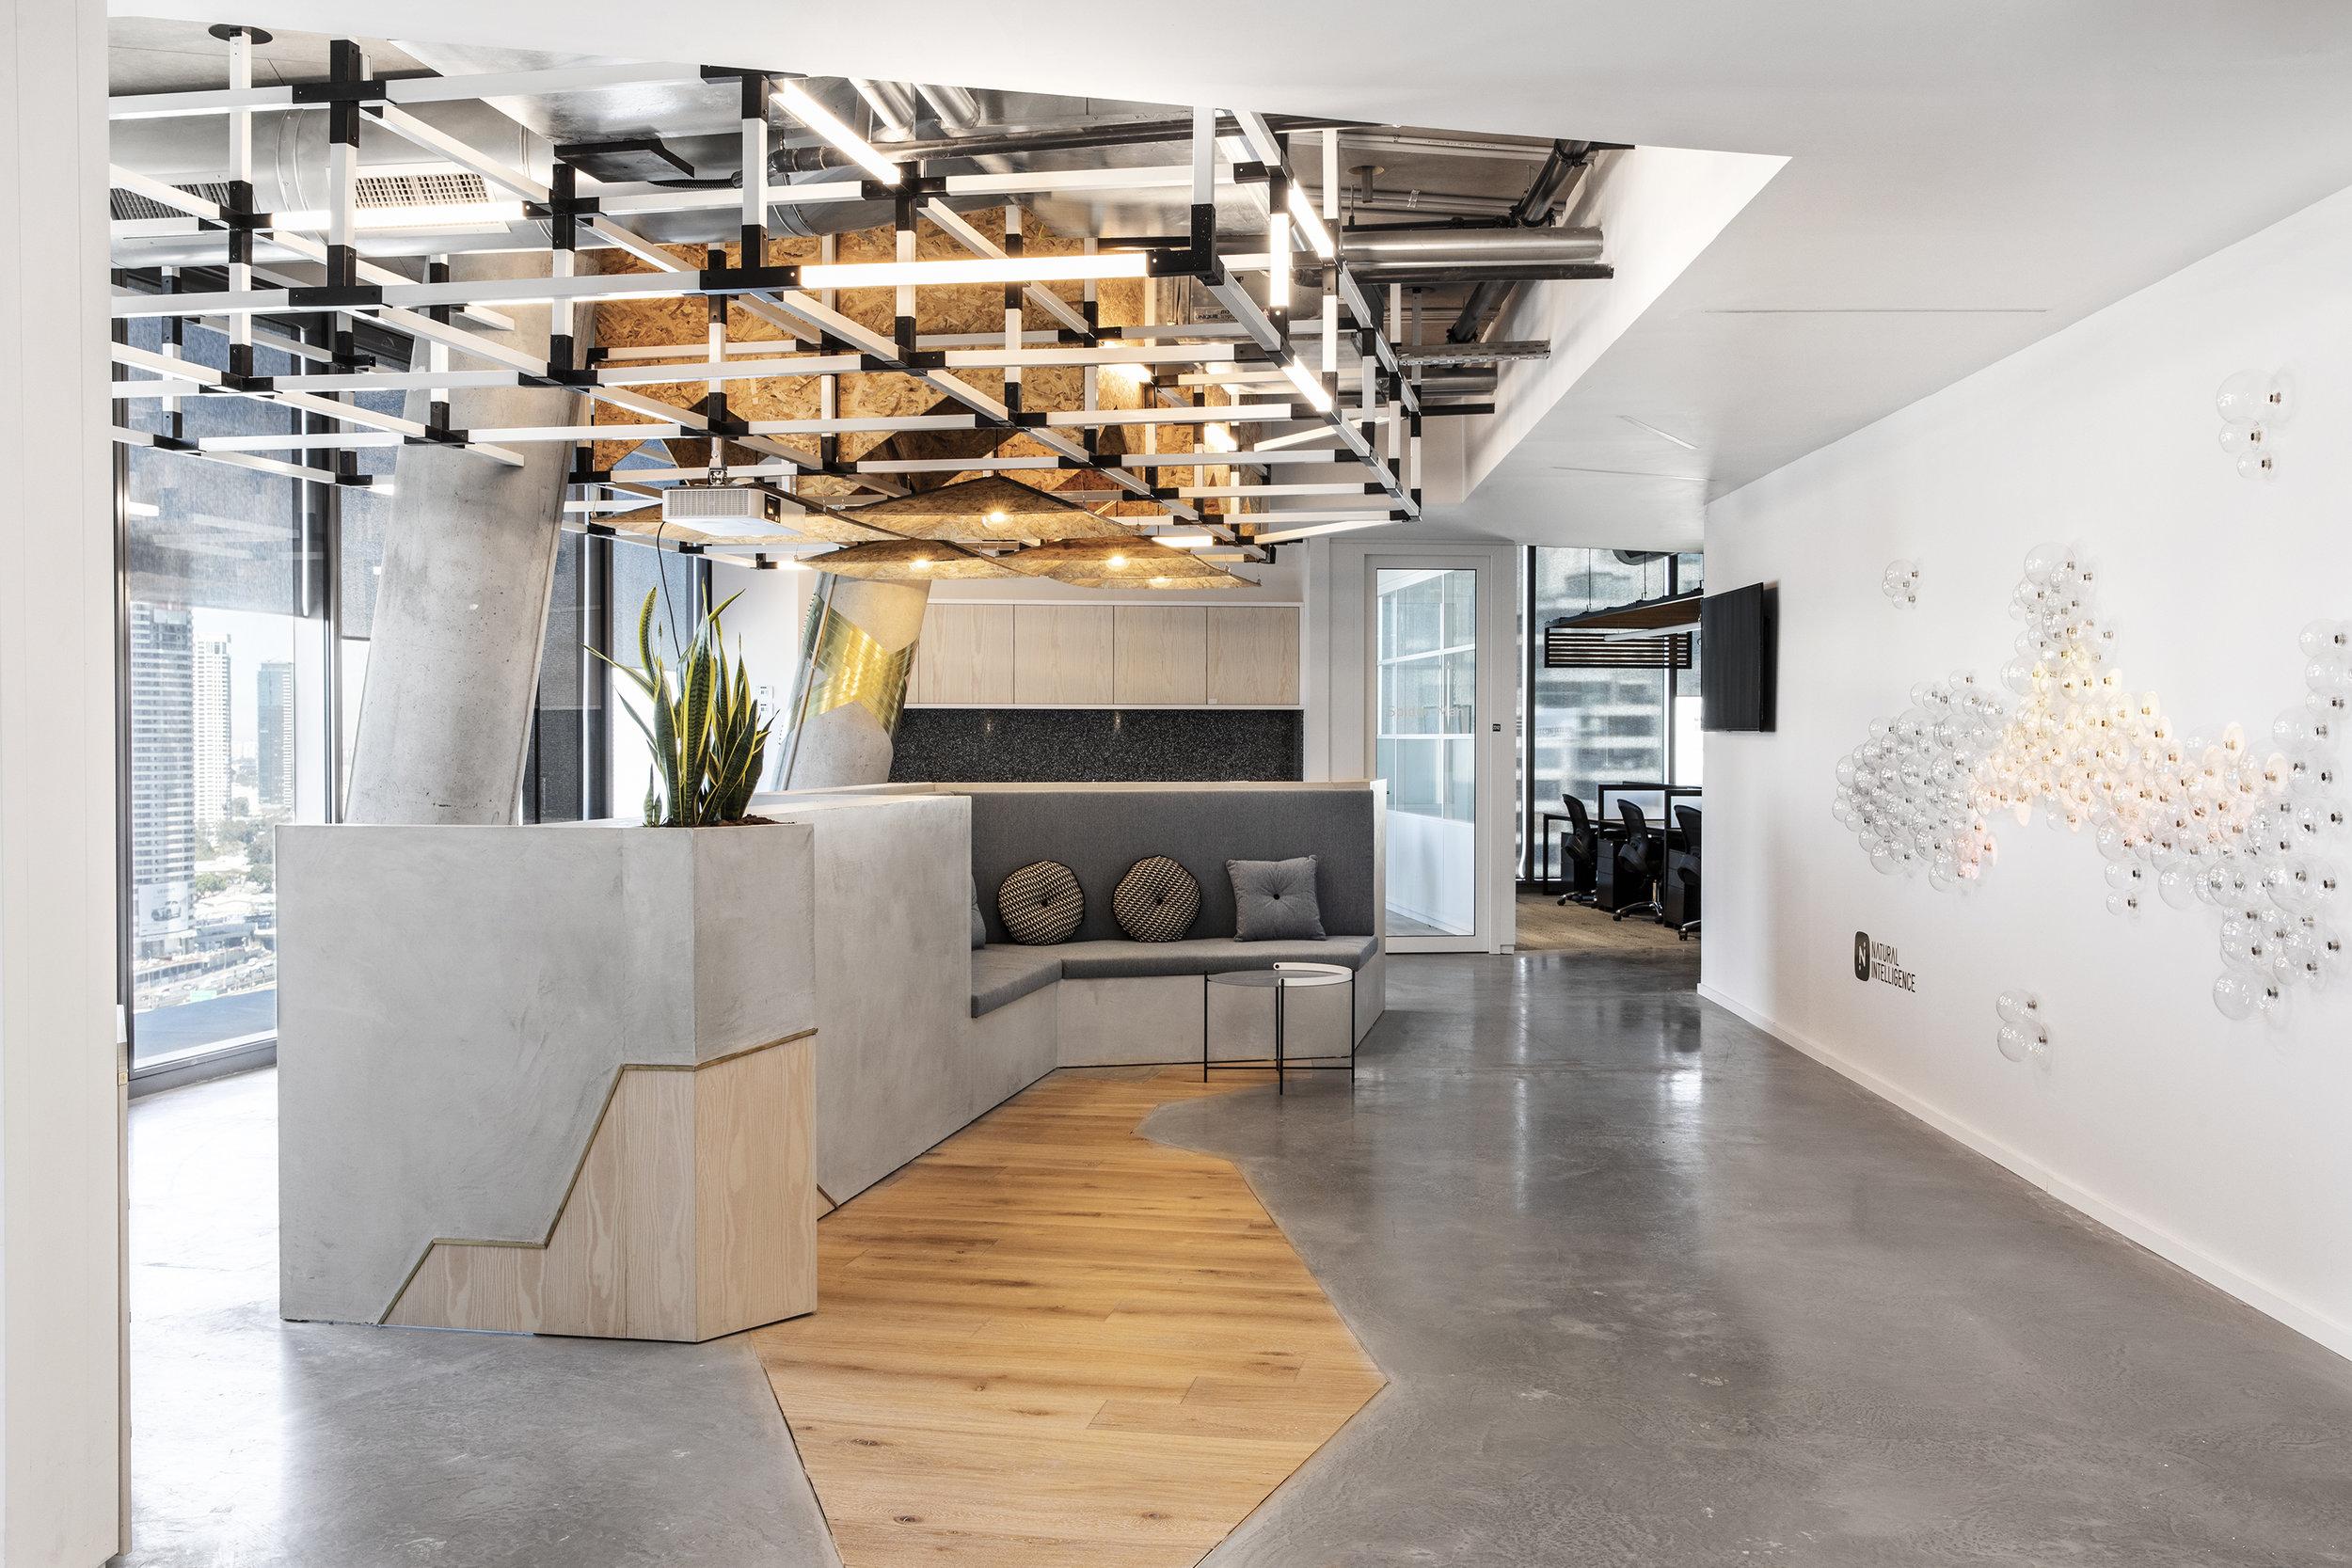 רואי דוד אדריכלות - אדריכל - נטורל אינטליג'נס - ROY DAVID - ARCHITECTURE - ARCHITECT - NI (56).jpg